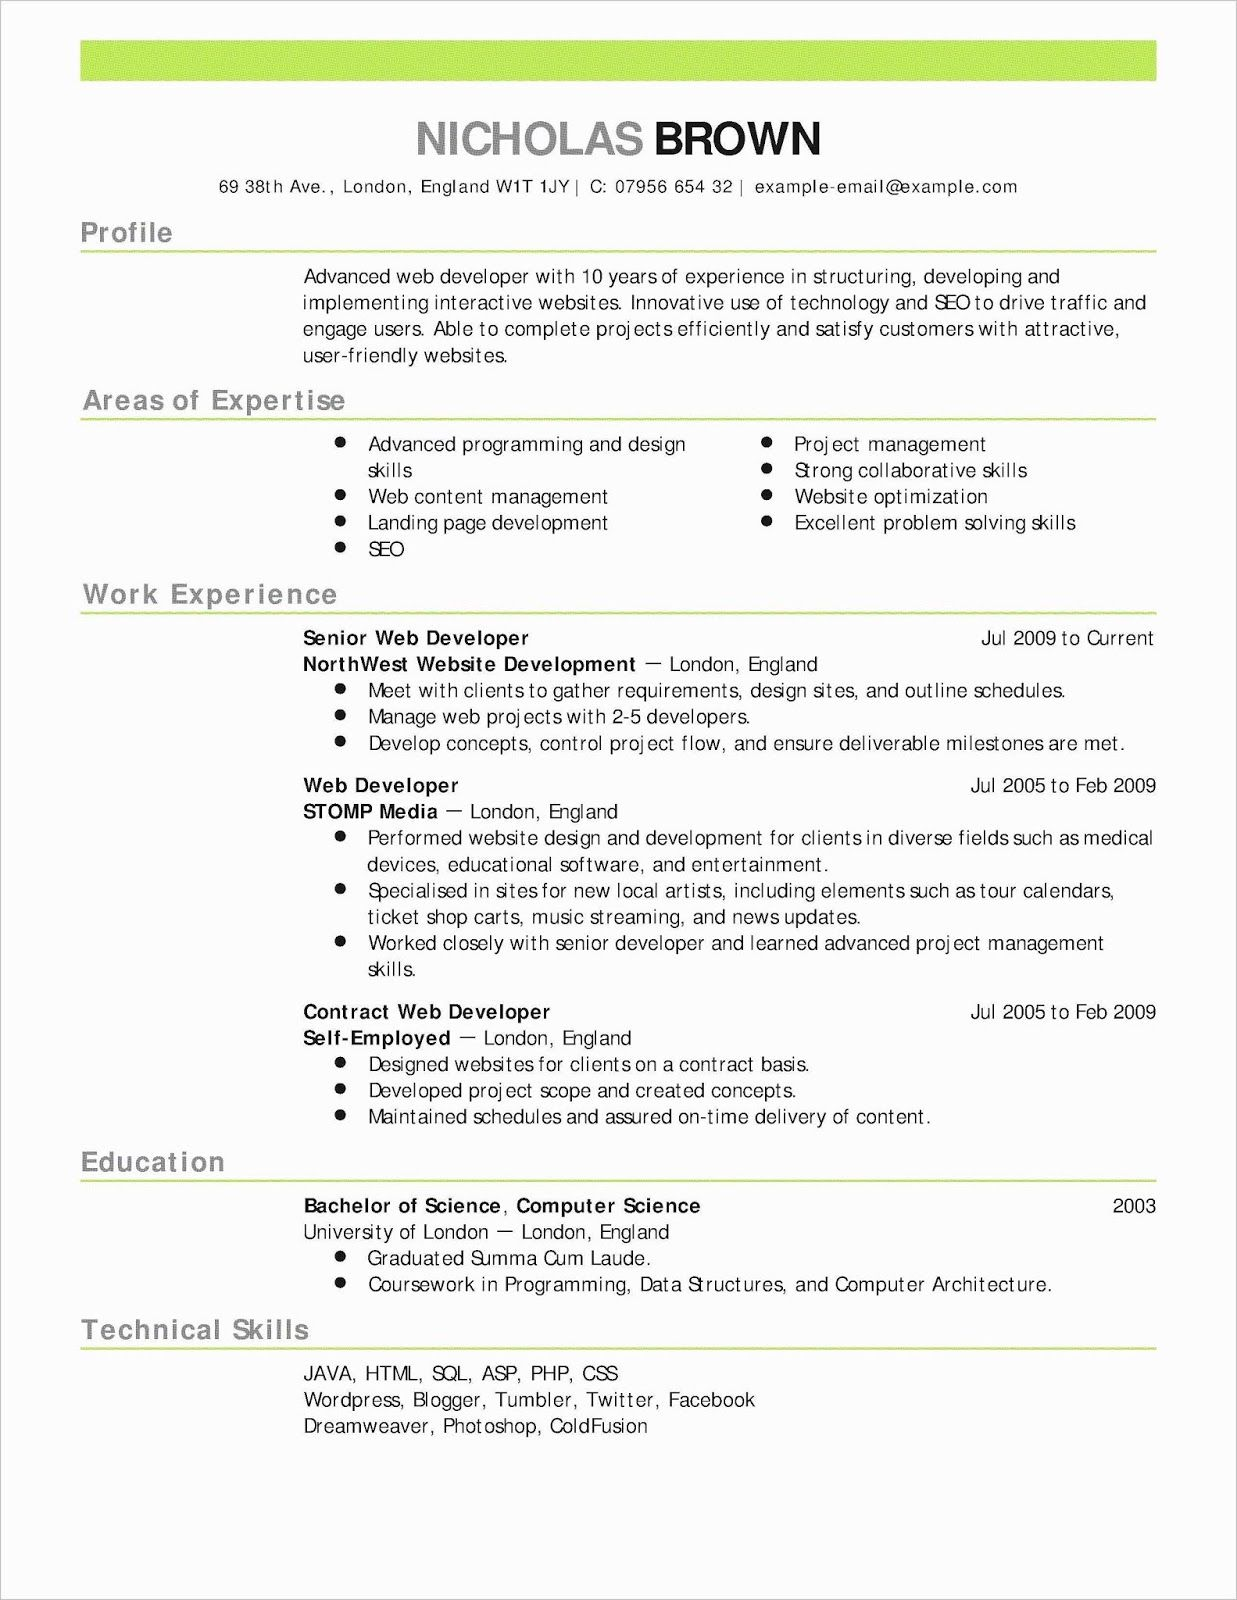 Indeed Job Resume 2019 Indeed Job Resume Search 2020 Indeed Job Resume Search Indeed Job Resume Update Indeed Job Resume Examples Teaching Resume Resume Skills